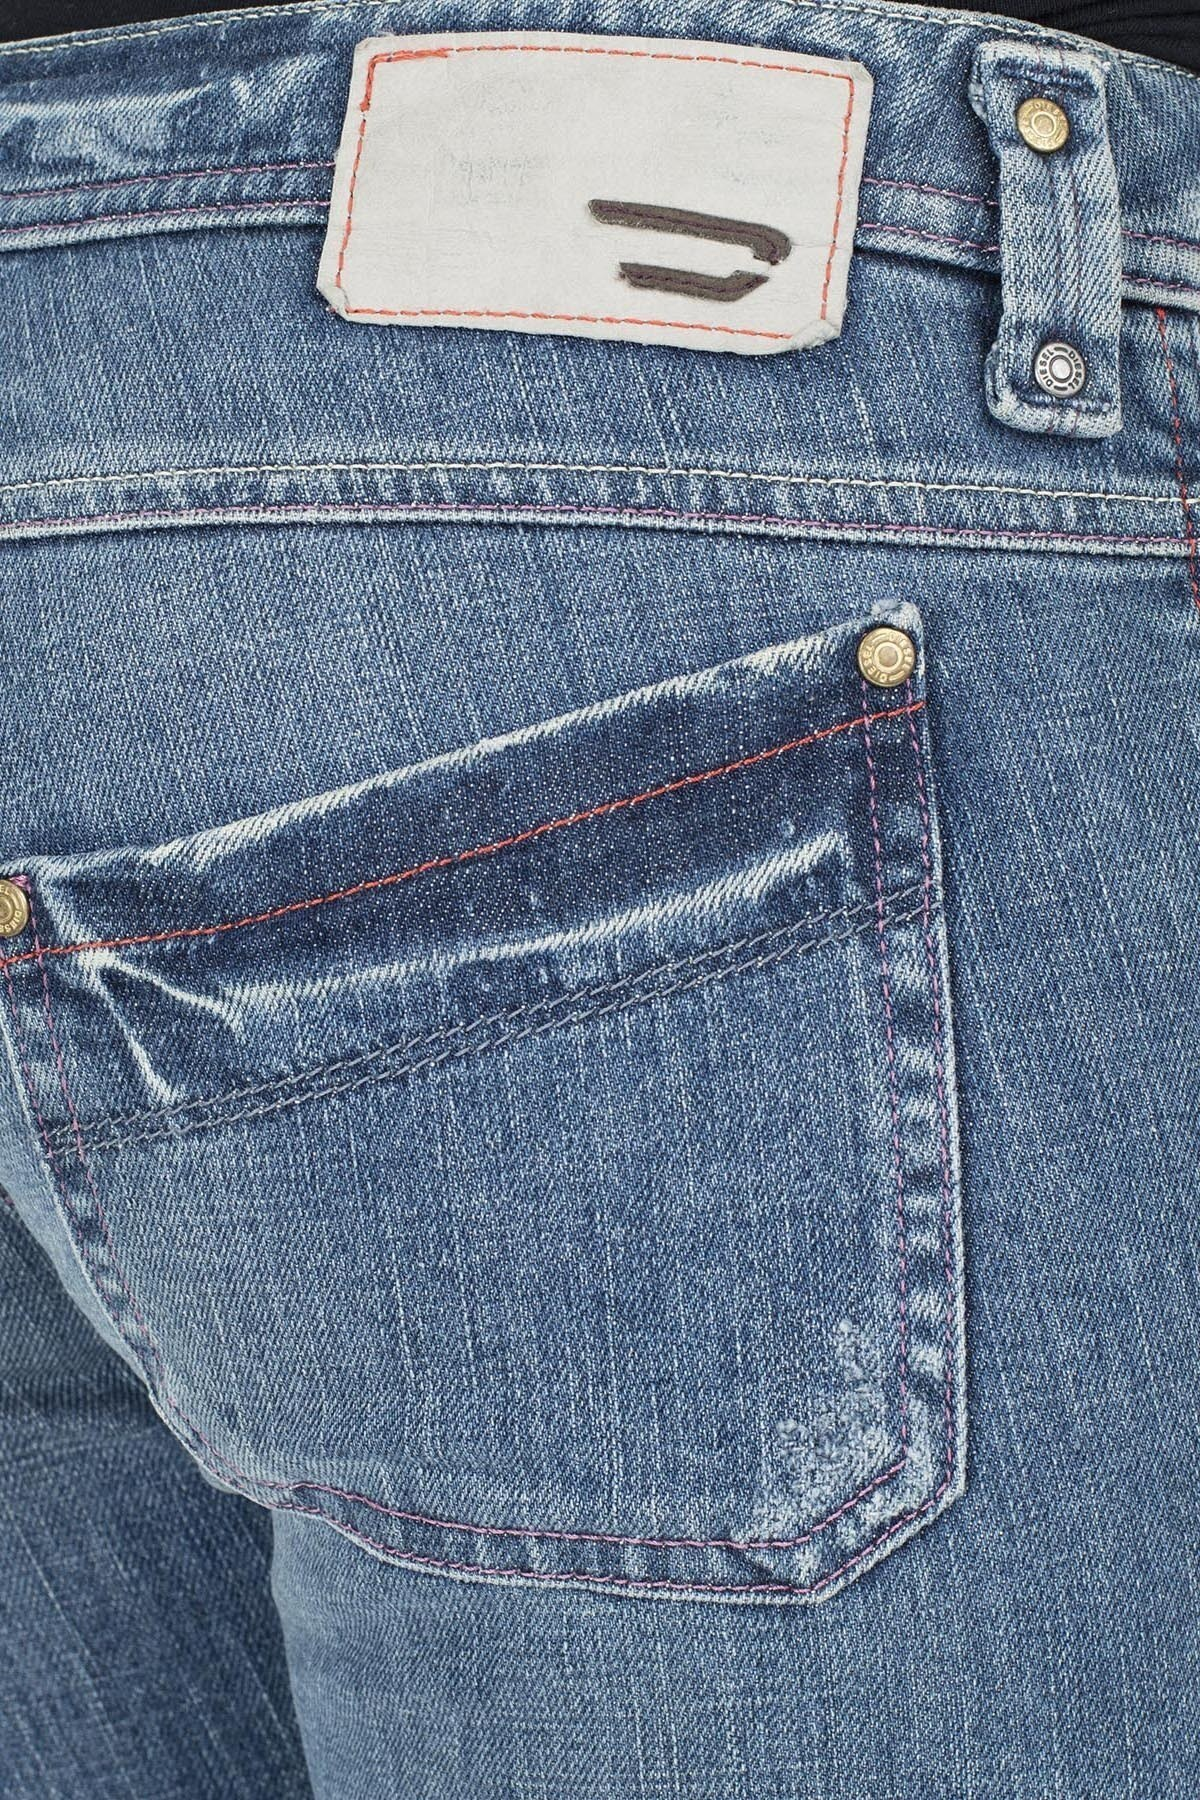 Diesel Jeans Kadın Kot Pantolon ZOXKEATE LACİVERT